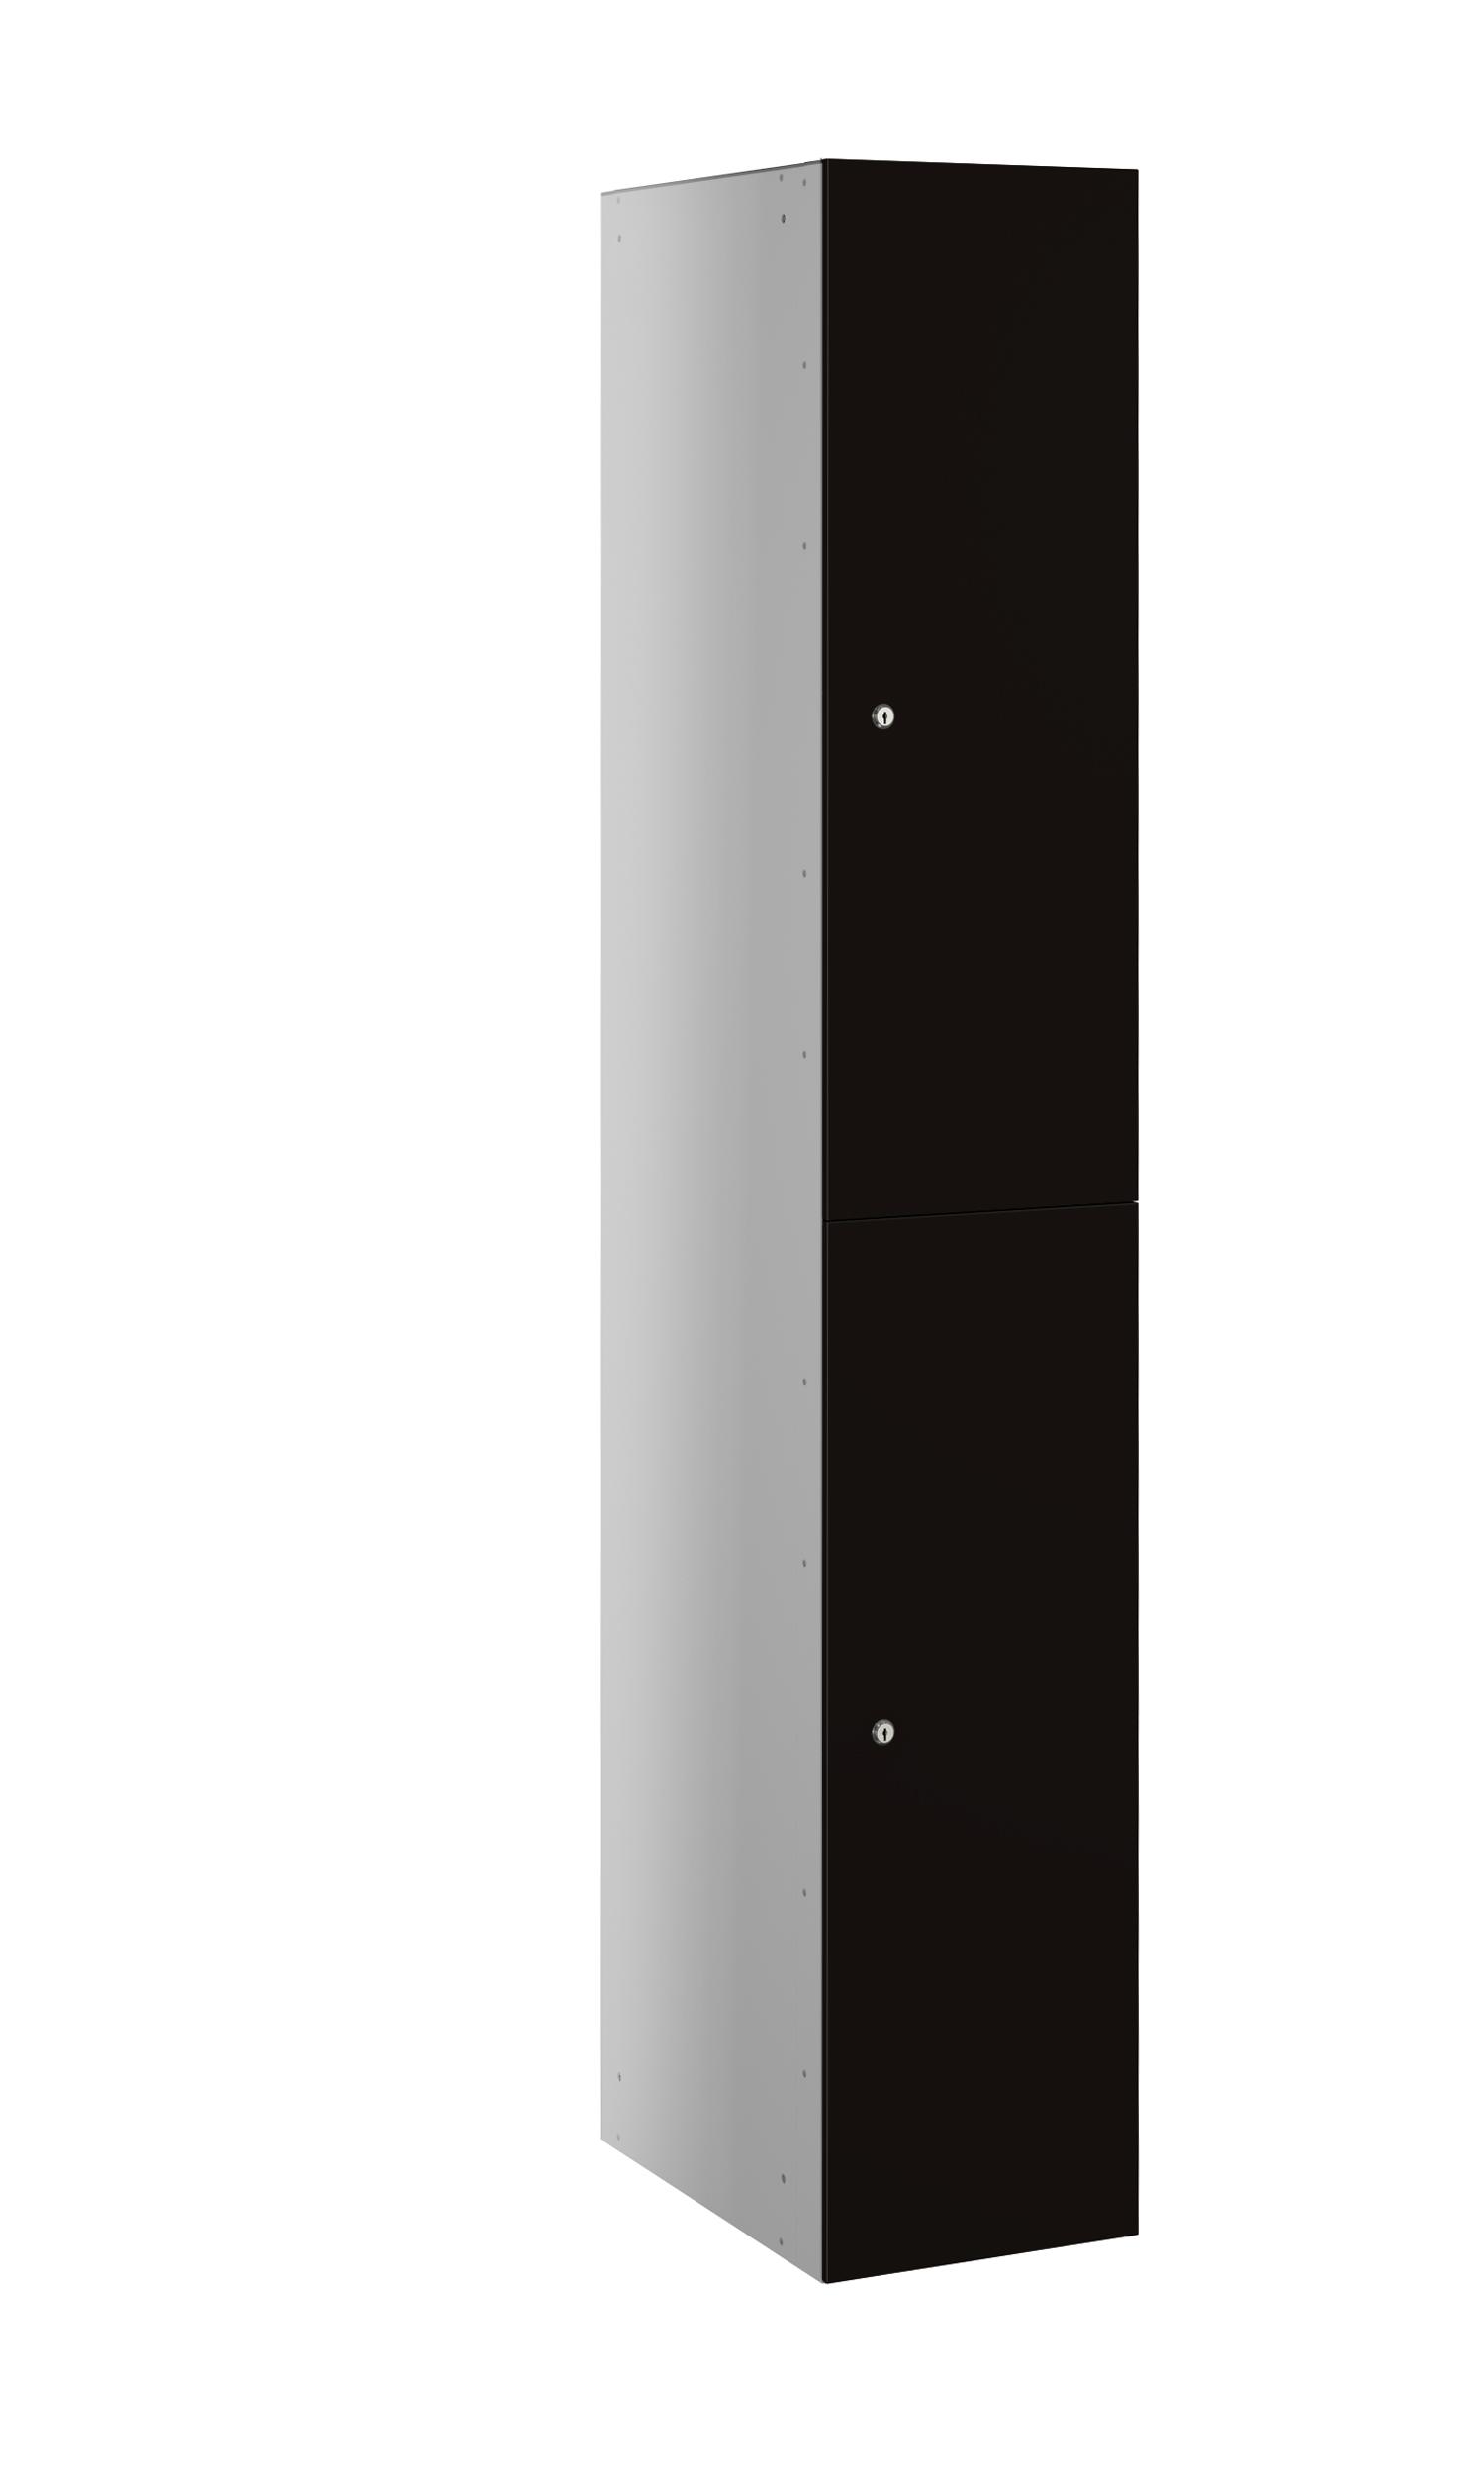 Probe buzzbox laminate 2 doors anthracite